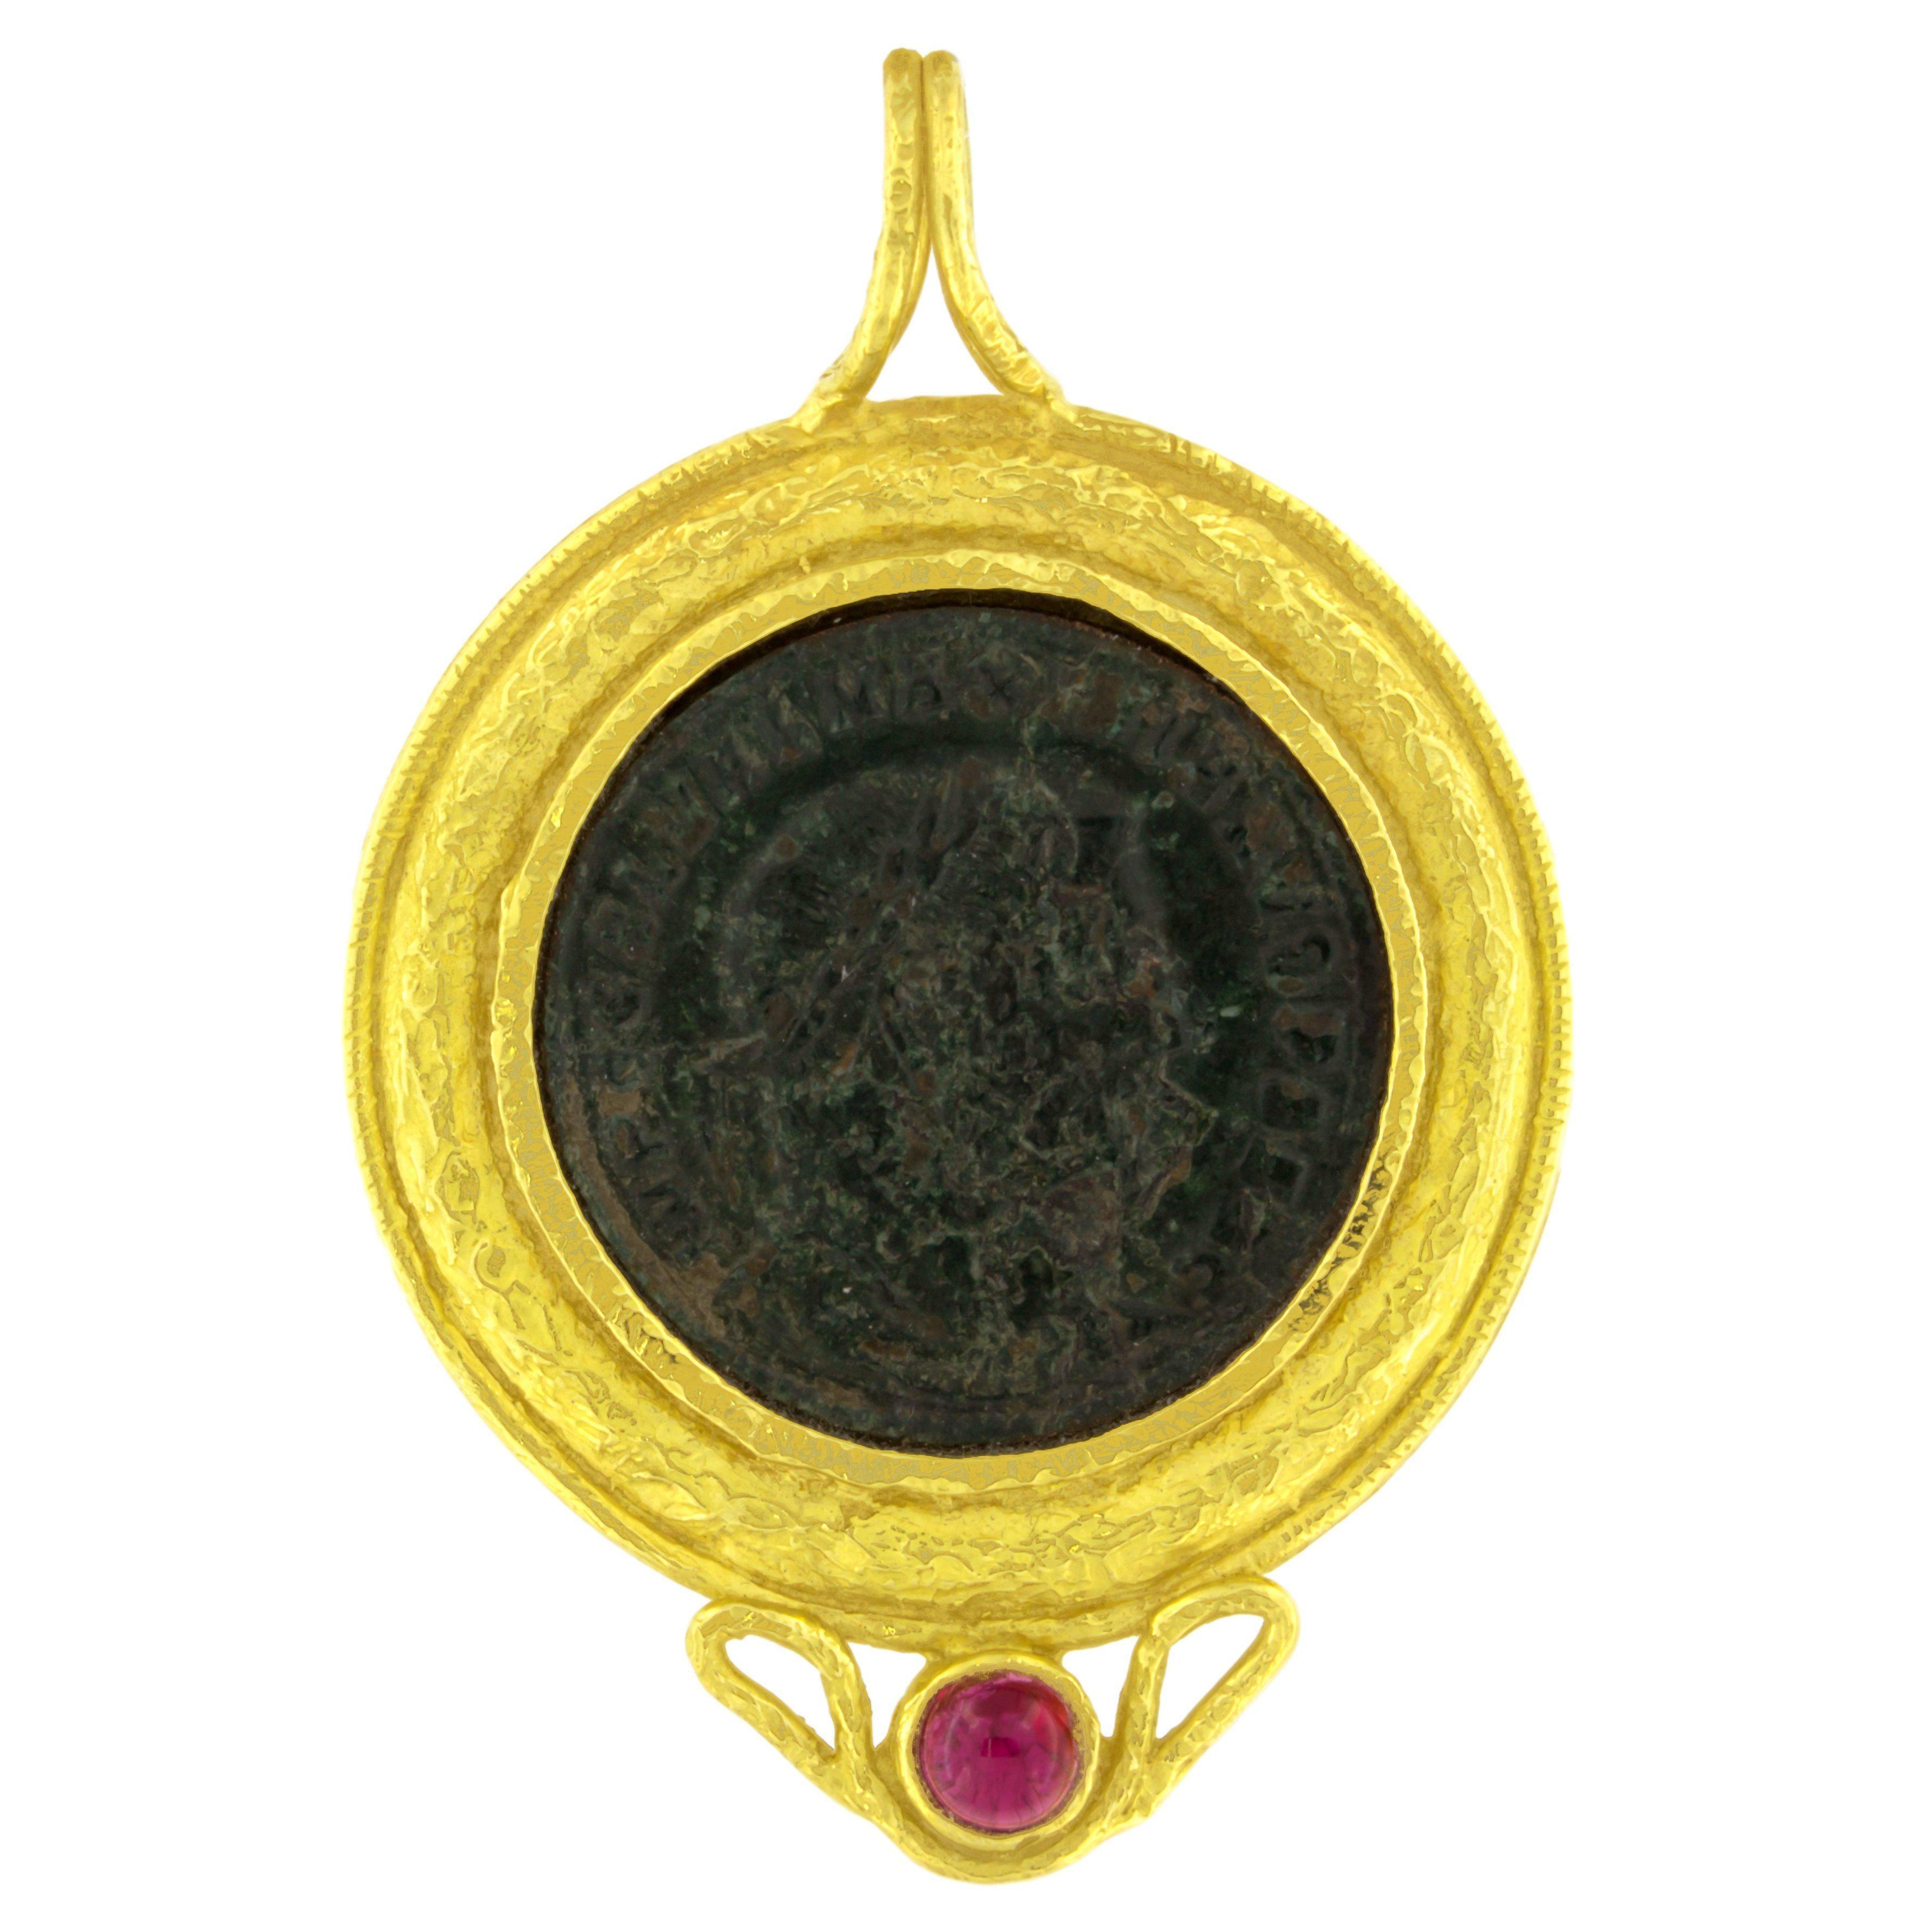 Sacchi Ancient Roman Coin and Tourmaline Gemstone 18 Karat Yellow Gold Pendant